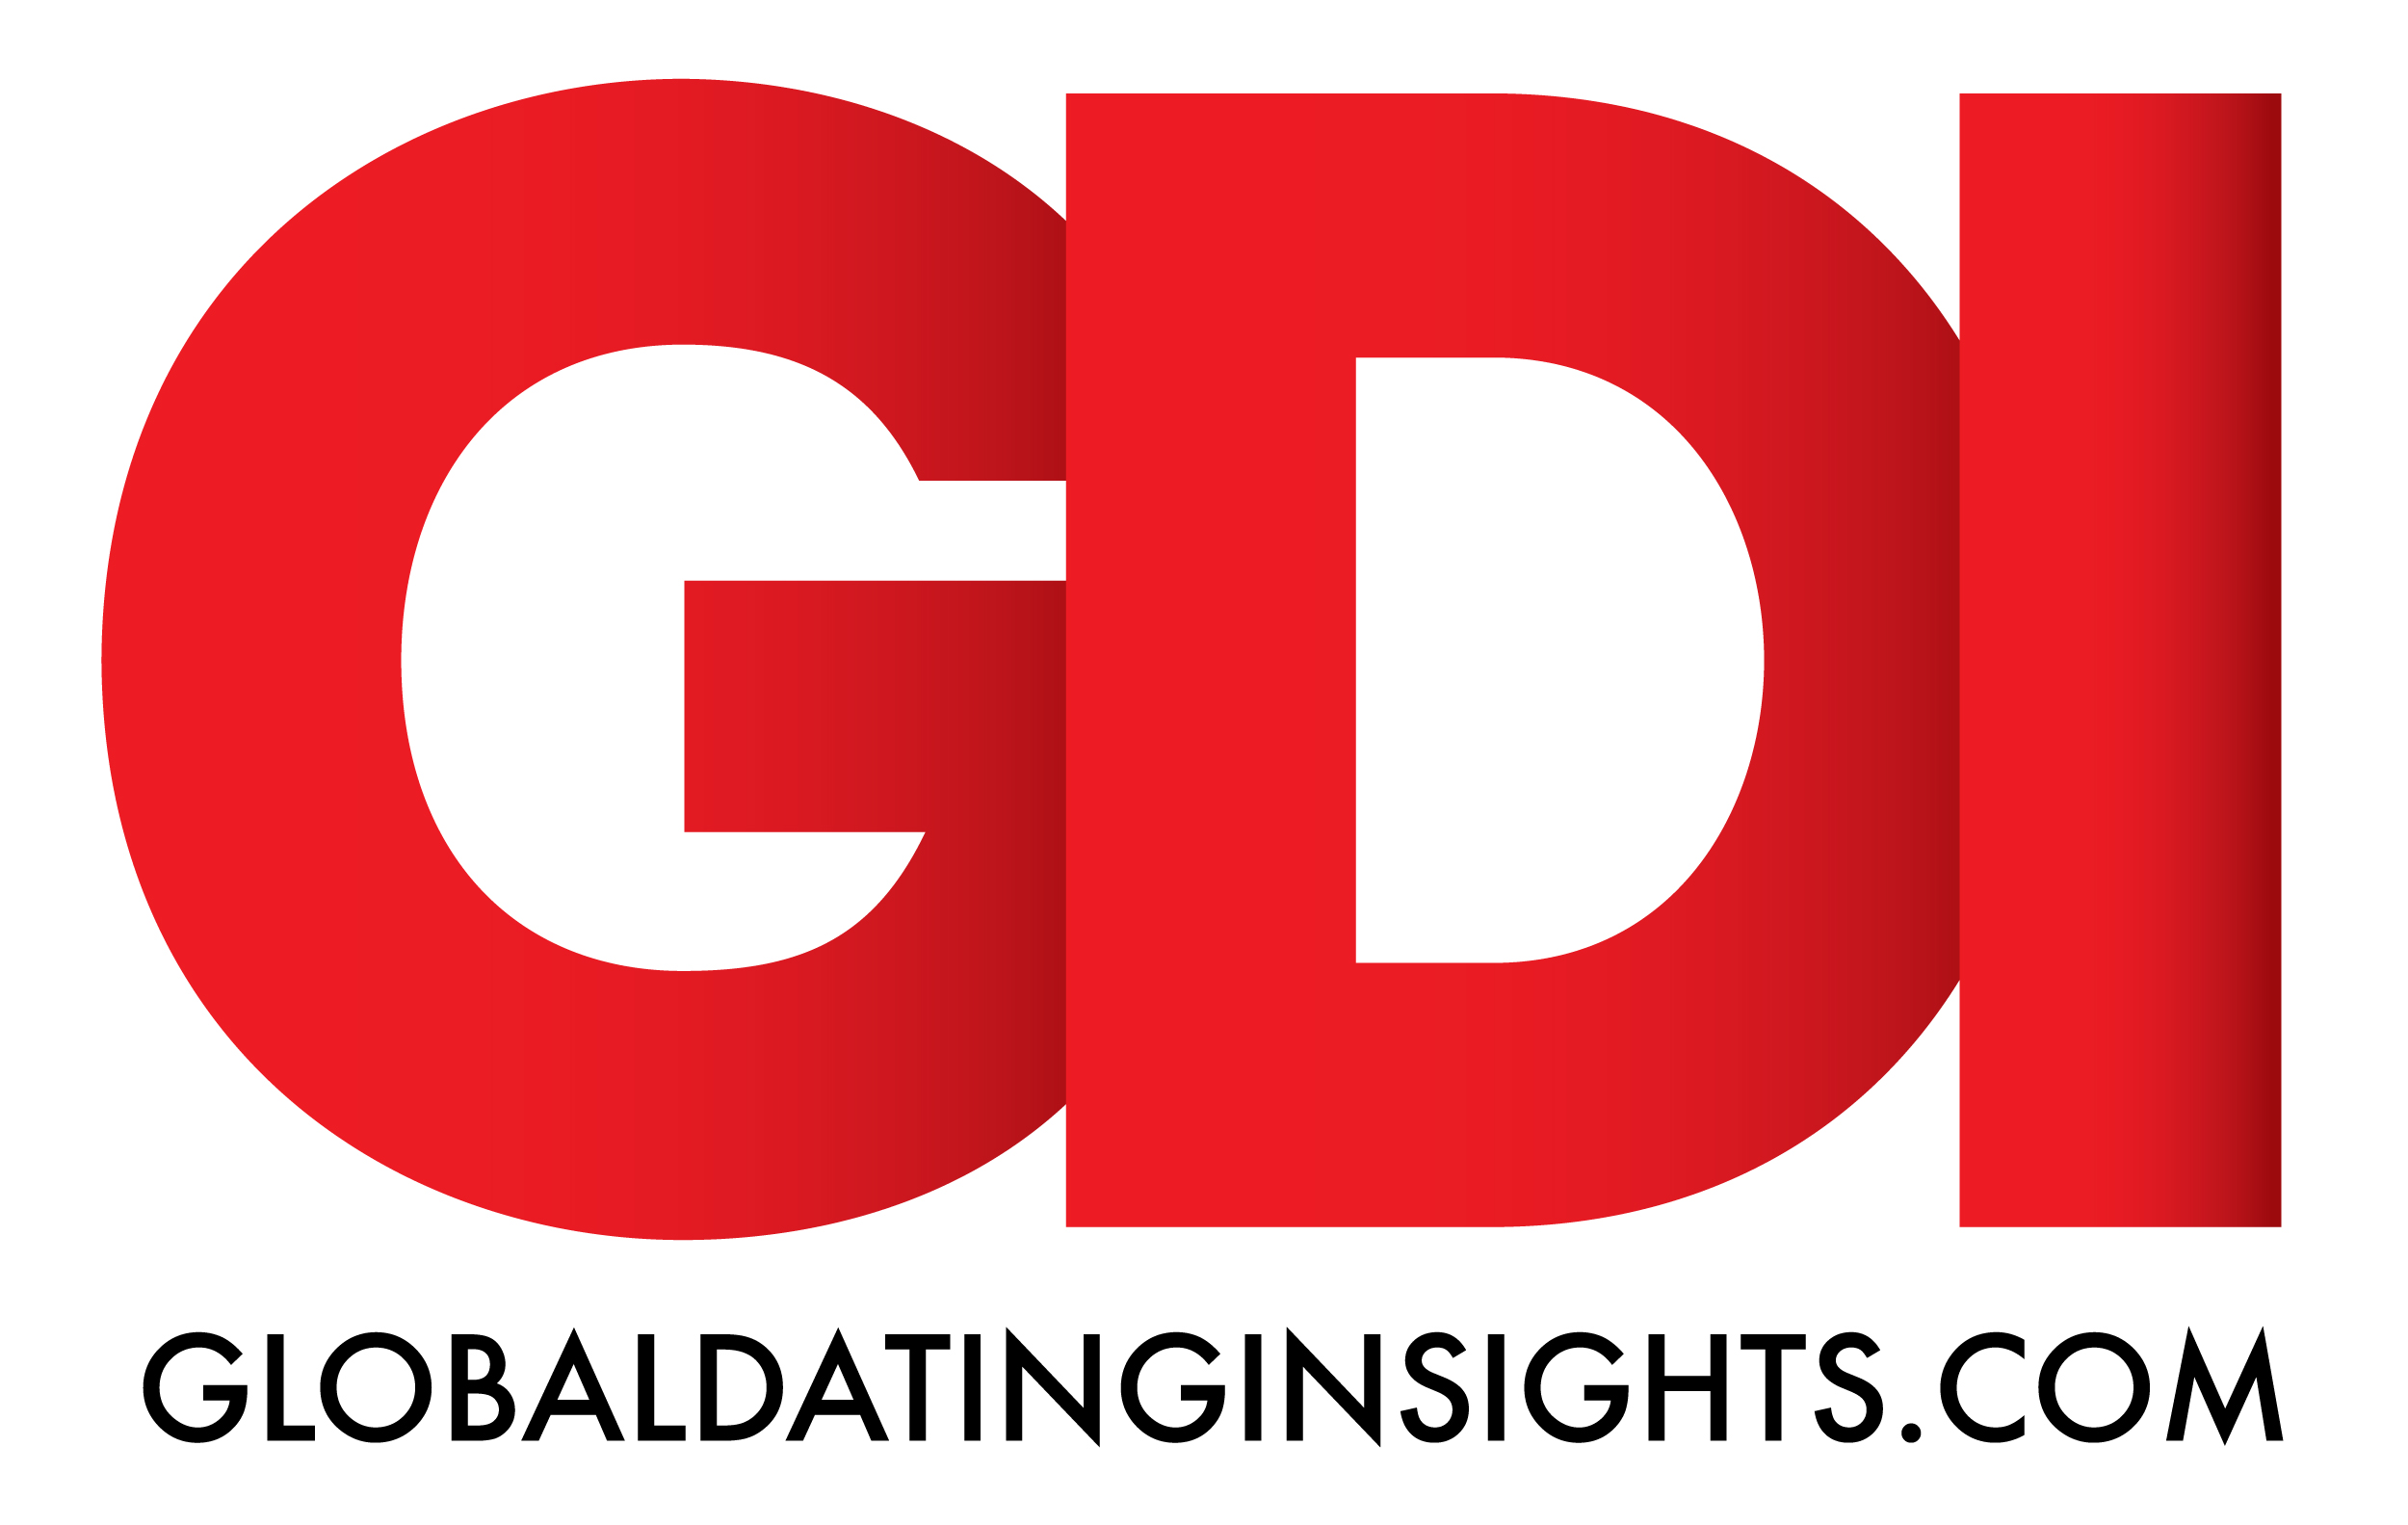 Global Dating Insights logo